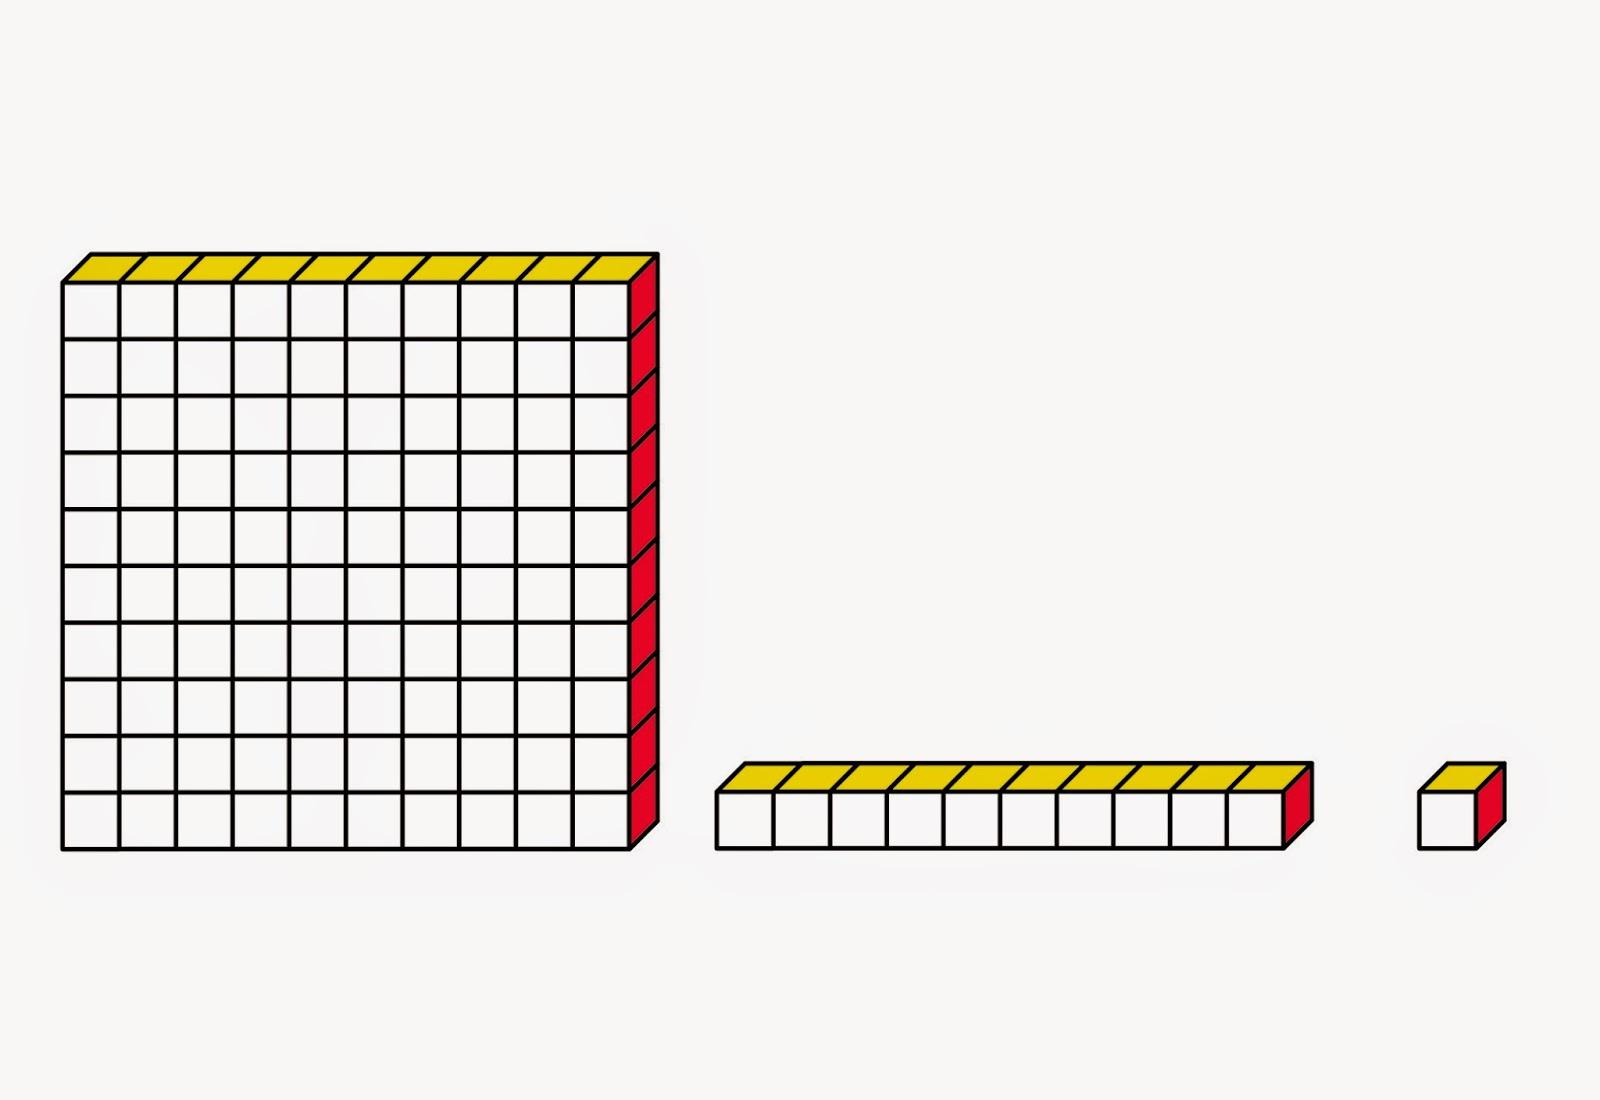 Transparent clipart base ten stick clip art transparent download Base Ten Blocks Clipart | Free download best Base Ten Blocks ... clip art transparent download